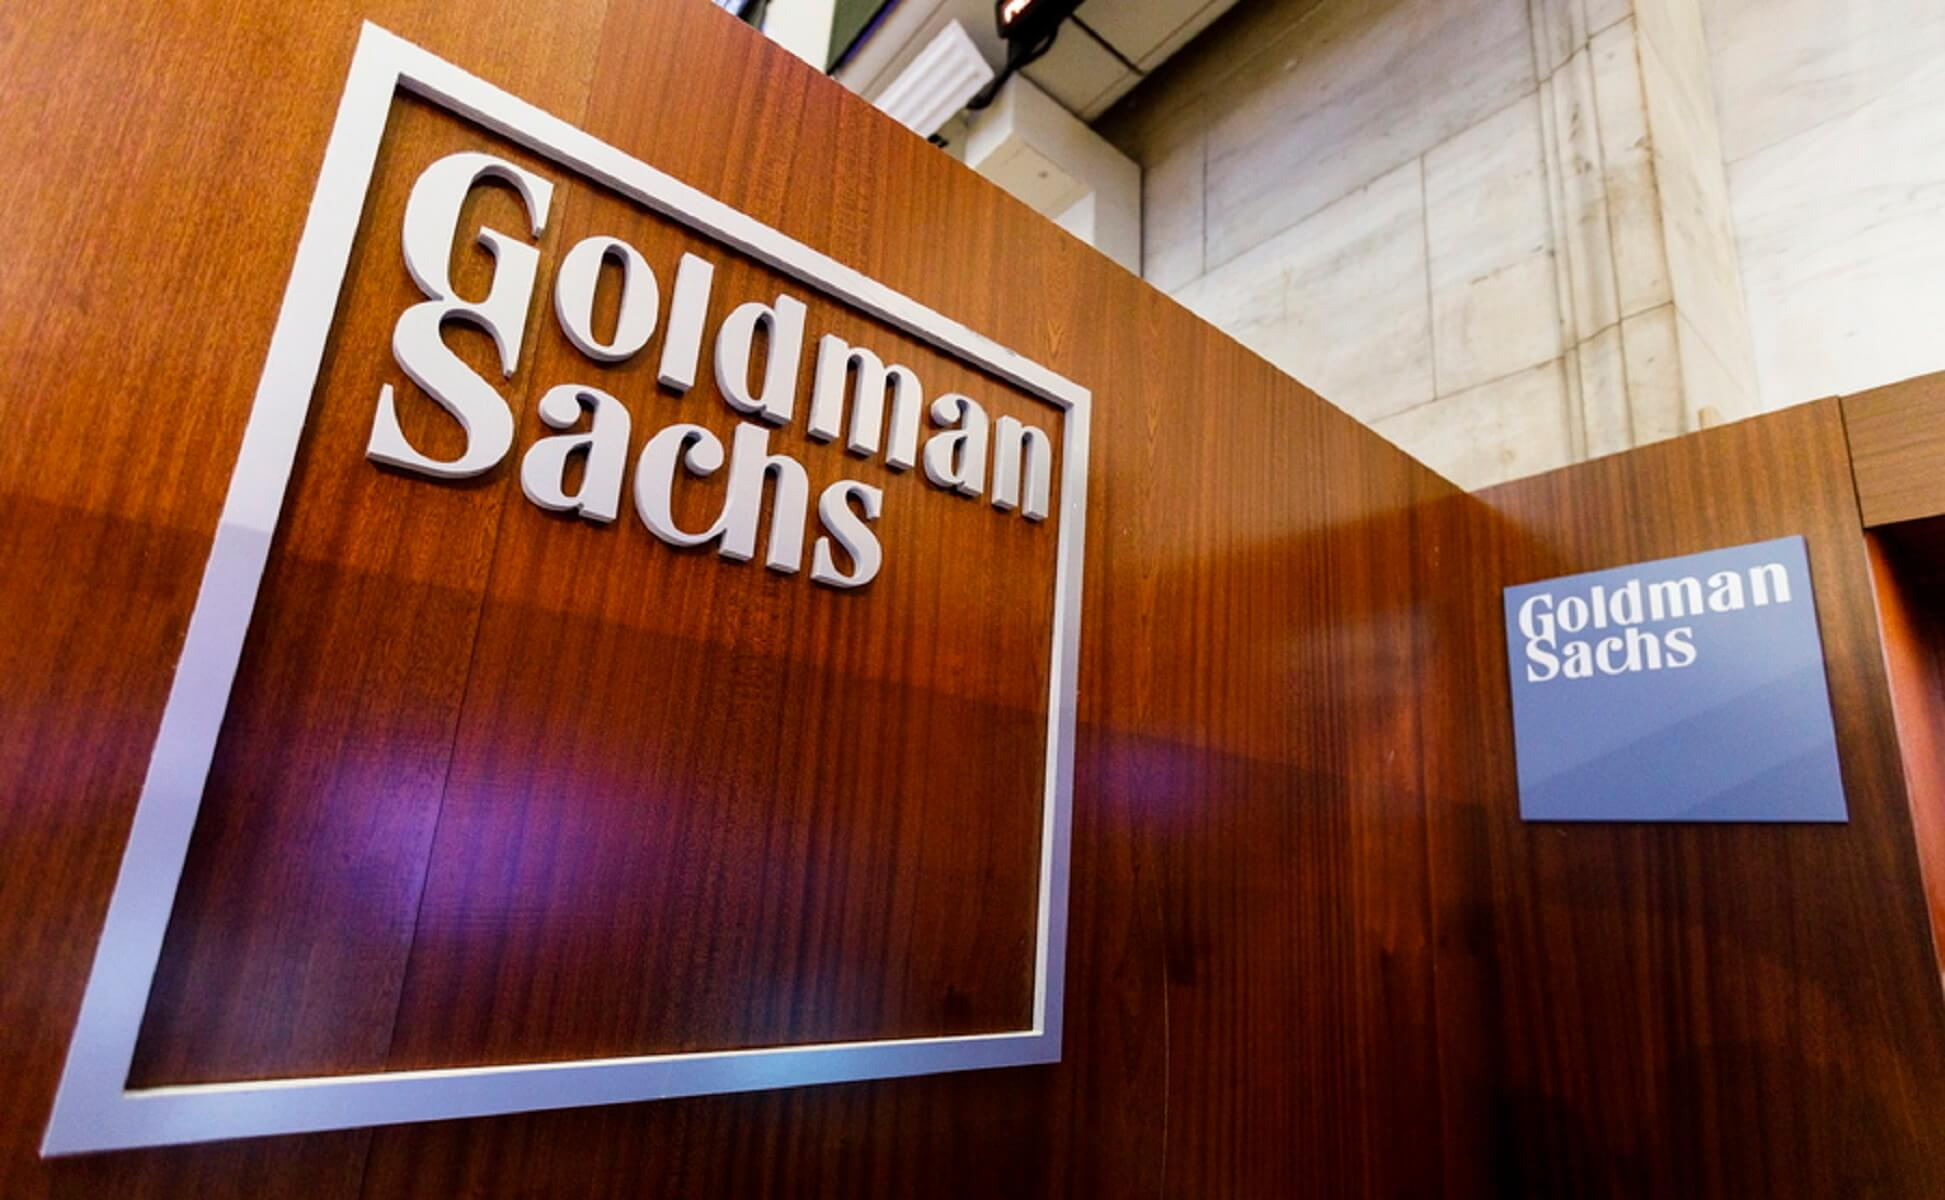 Brexit: 600 εκατομμύρια λίρες την εβδομάδα χάνει η Βρετανία σύμφωνα με την Goldman Sachs